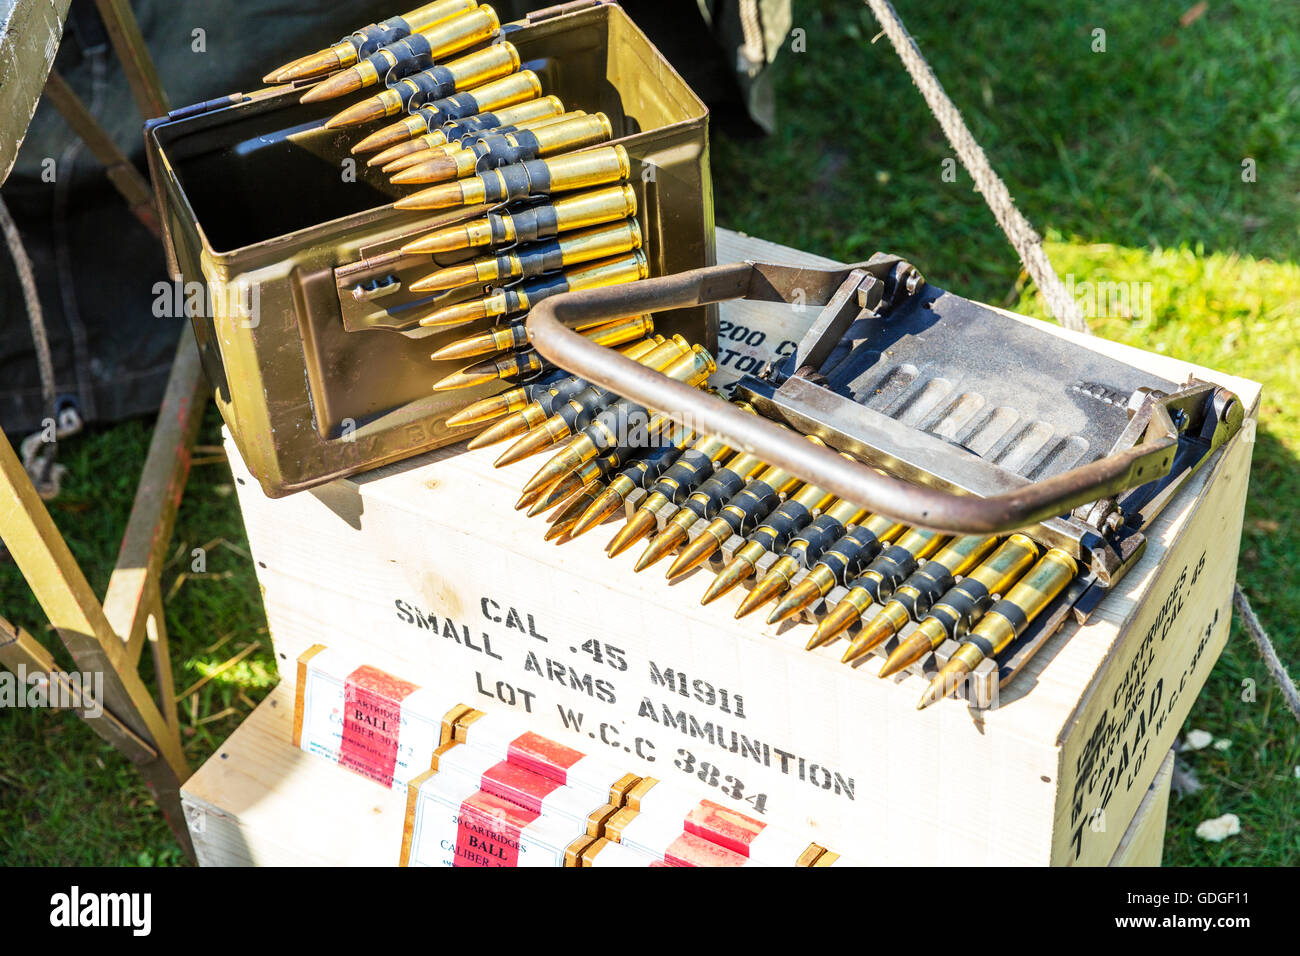 Bullets ammunition .45 cal caliber small arms ammunition boxes for war killing people devastation of lives murder - Stock Image